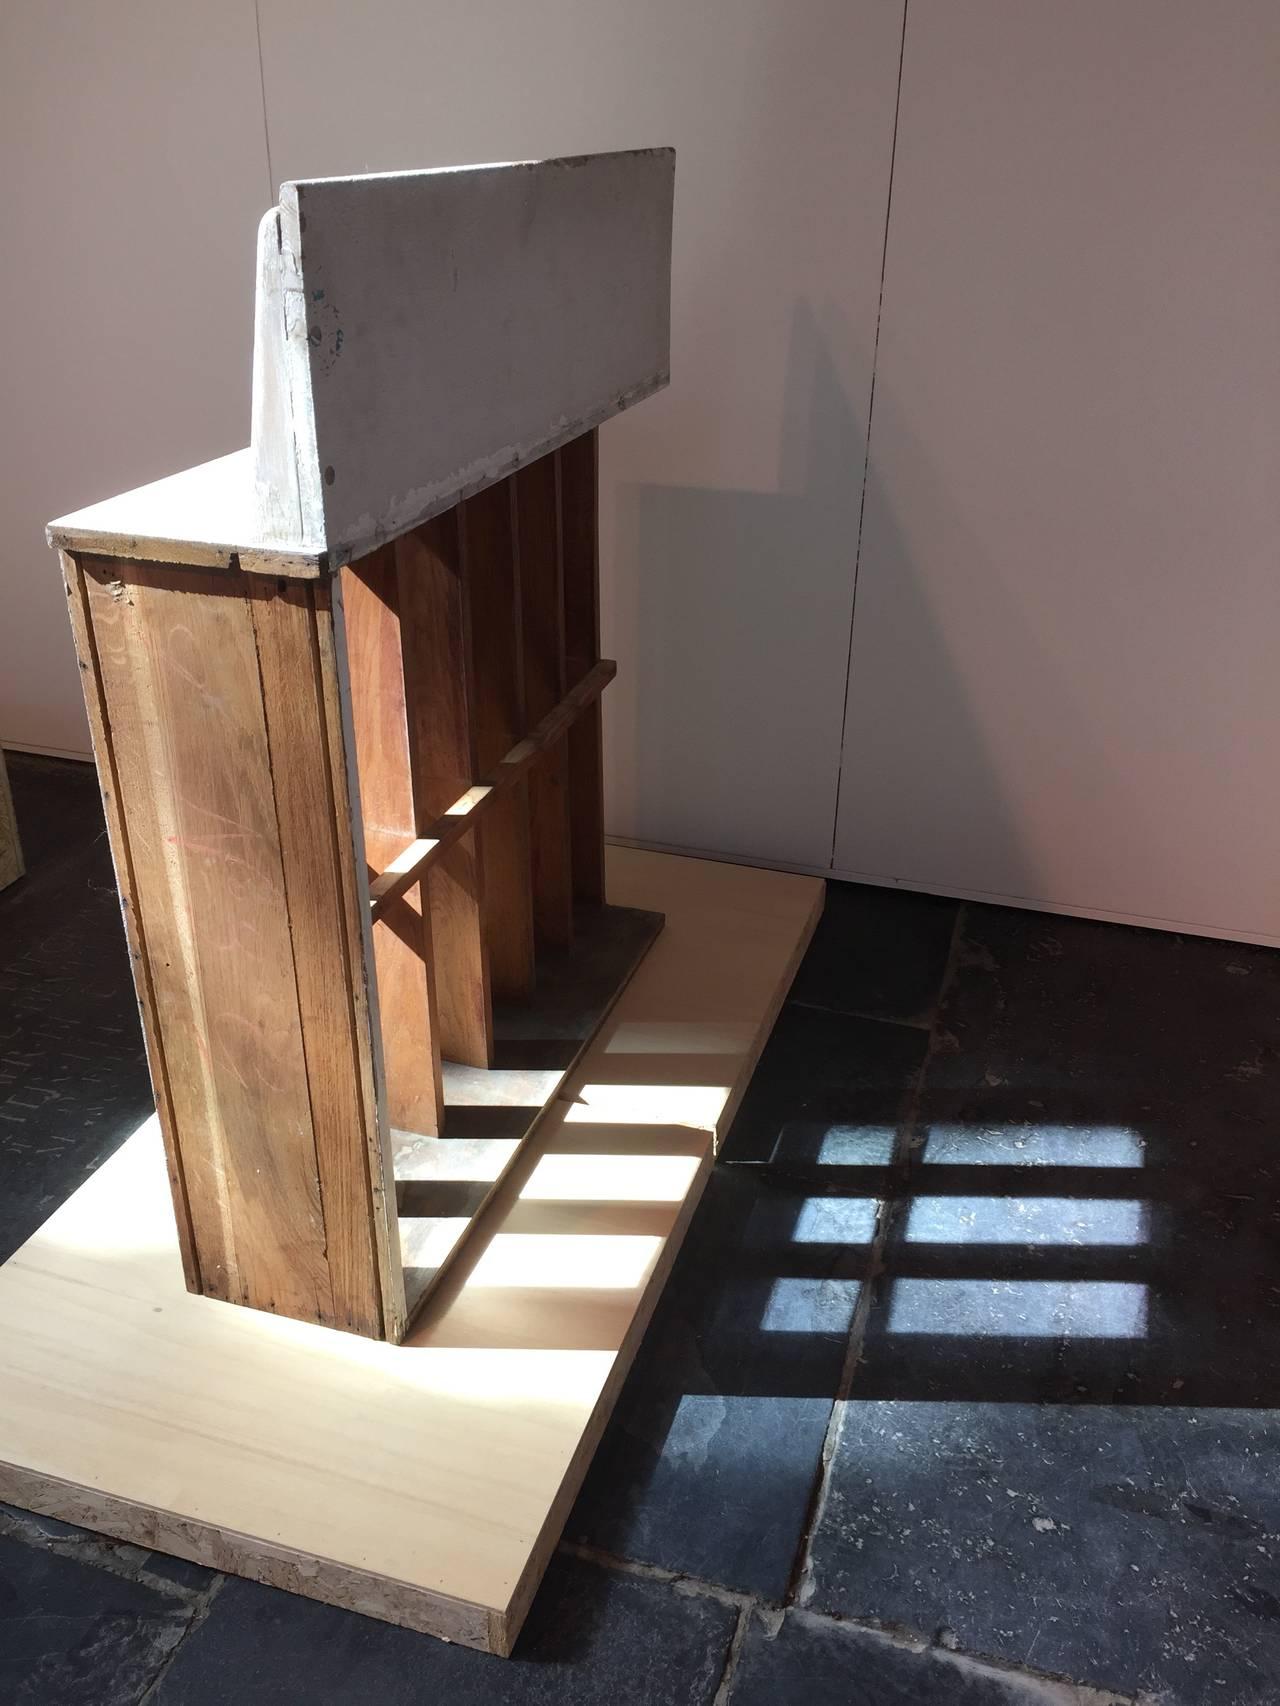 Salvaged Oak Brise Soleil From The Le Corbusier S Unite